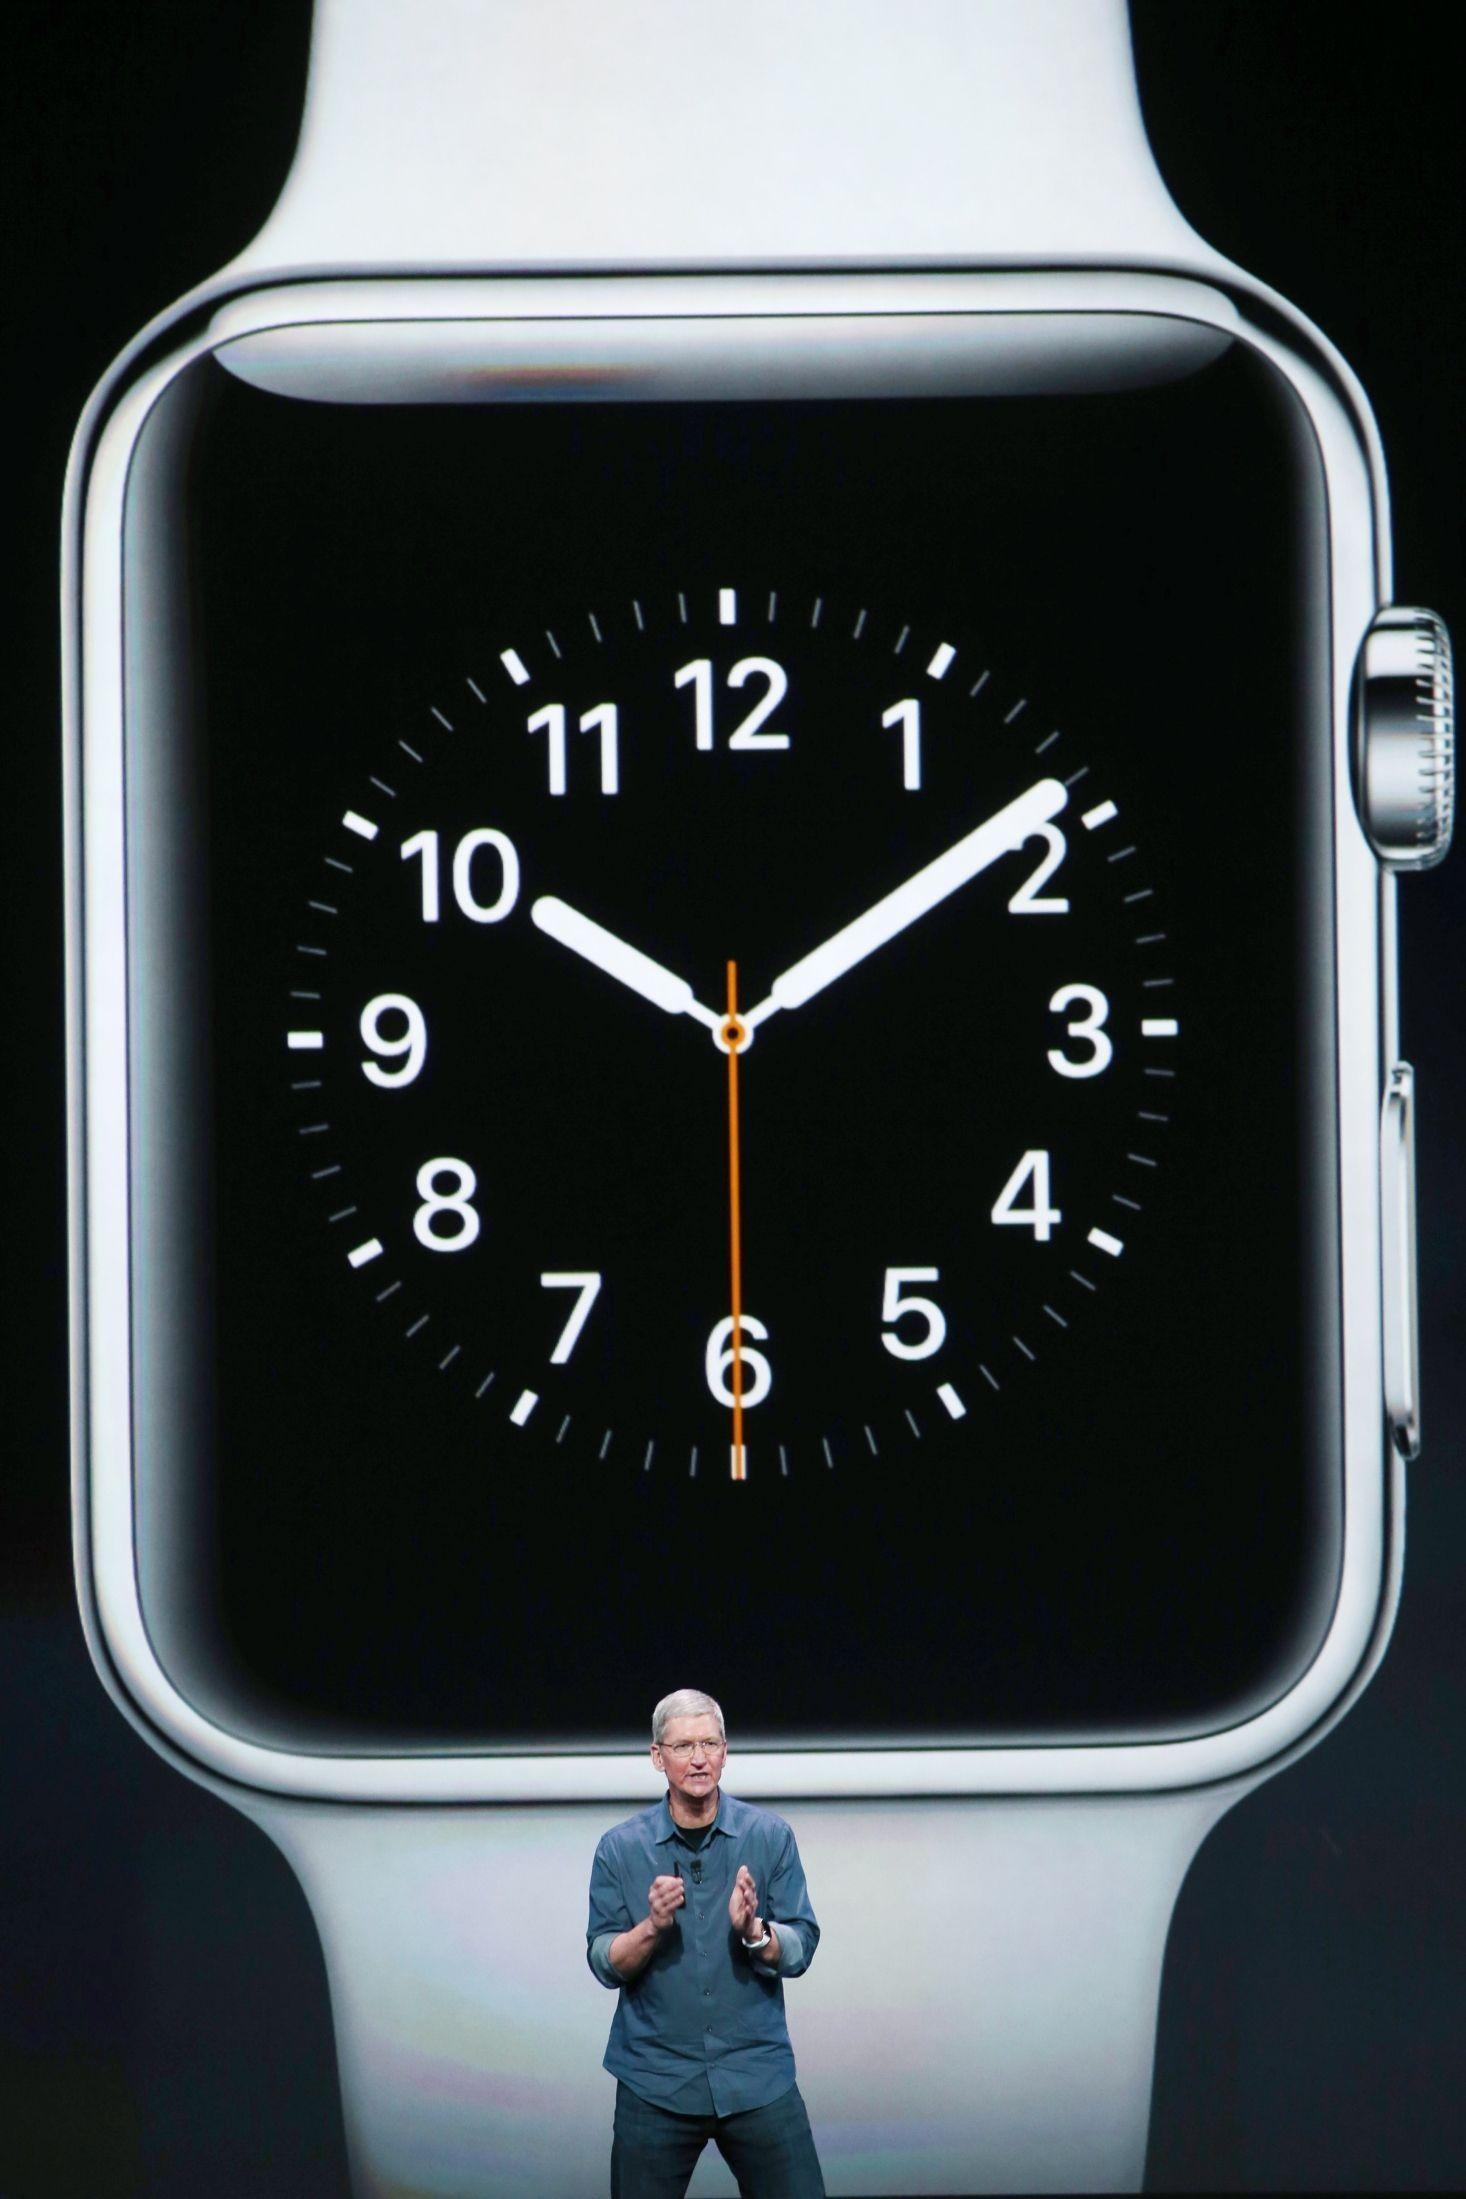 Applesjef Tim Cook annonserte smartklokken Apple Watch tirsdag kveld.